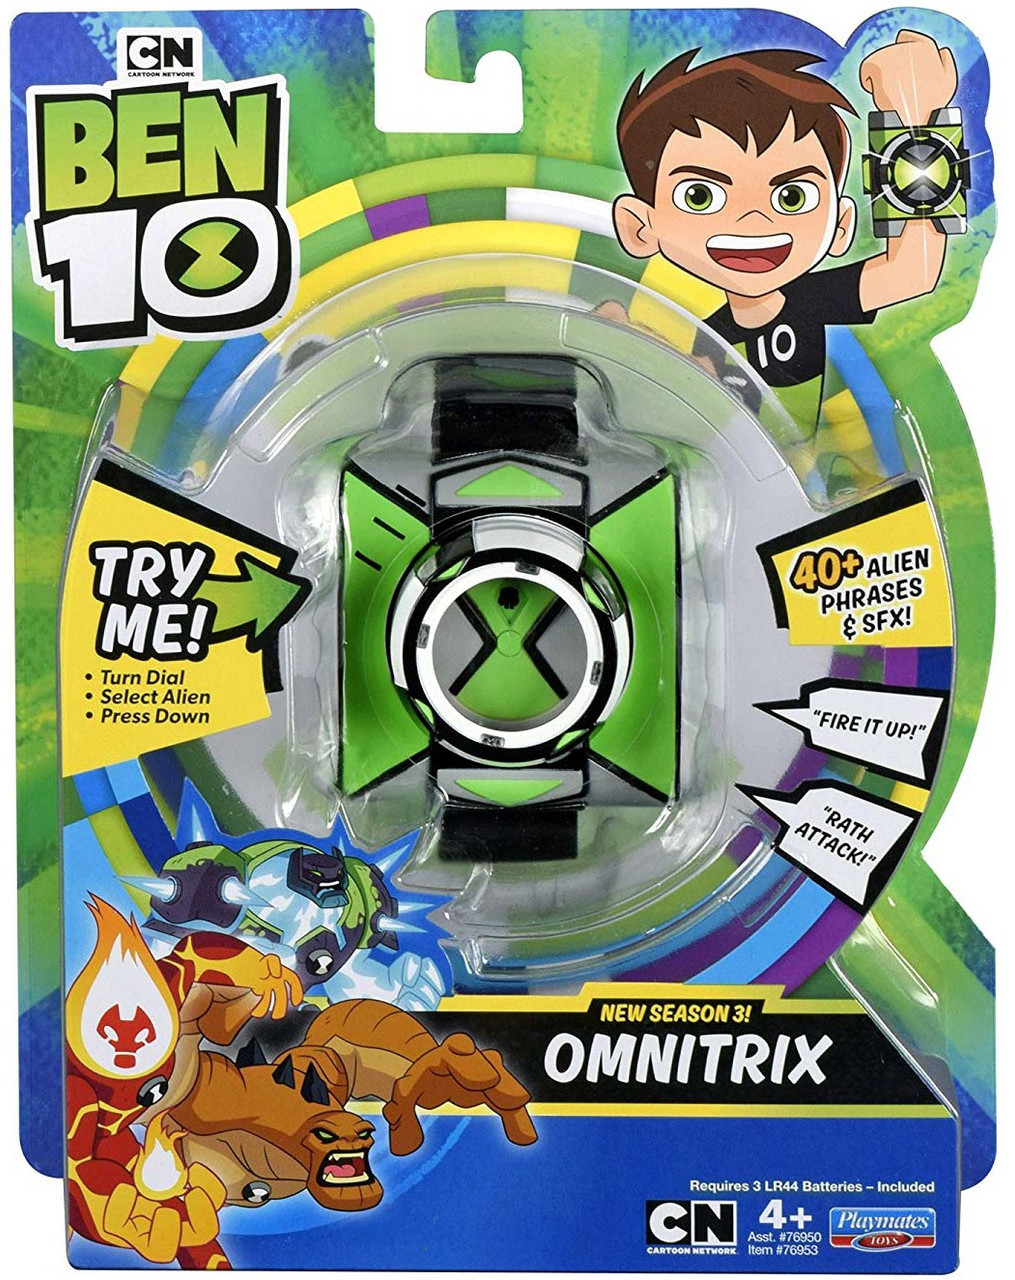 Ben 10 theme pack freefor windows 7